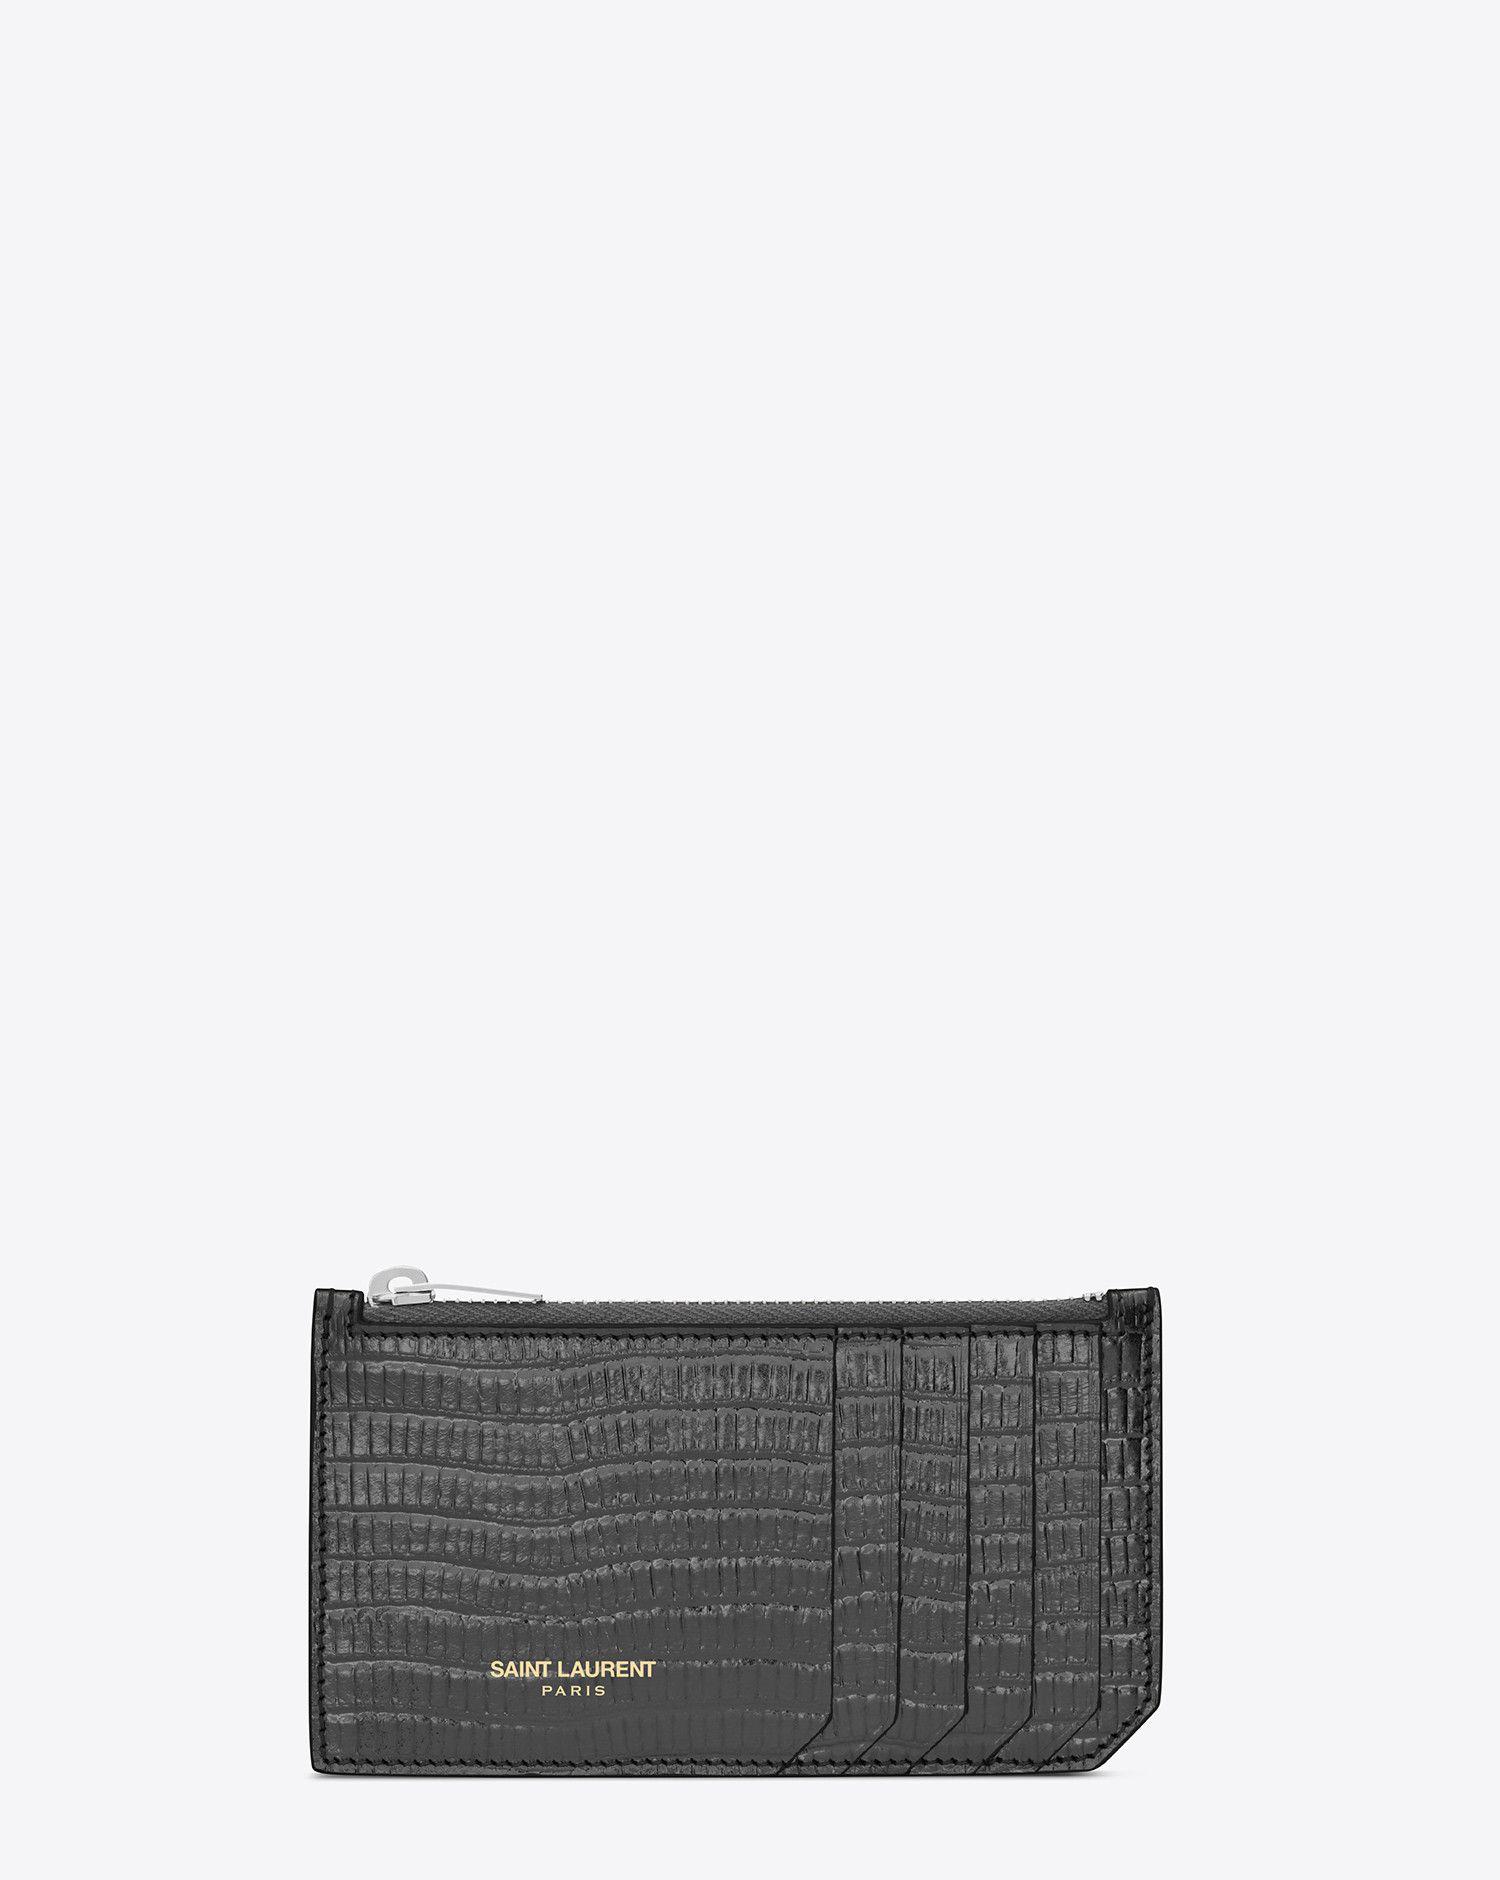 Saint Laurent Classic SAINT LAURENT 5 Fragments Zip Pouch In Graphite Lizard Textured Metallic Leather  